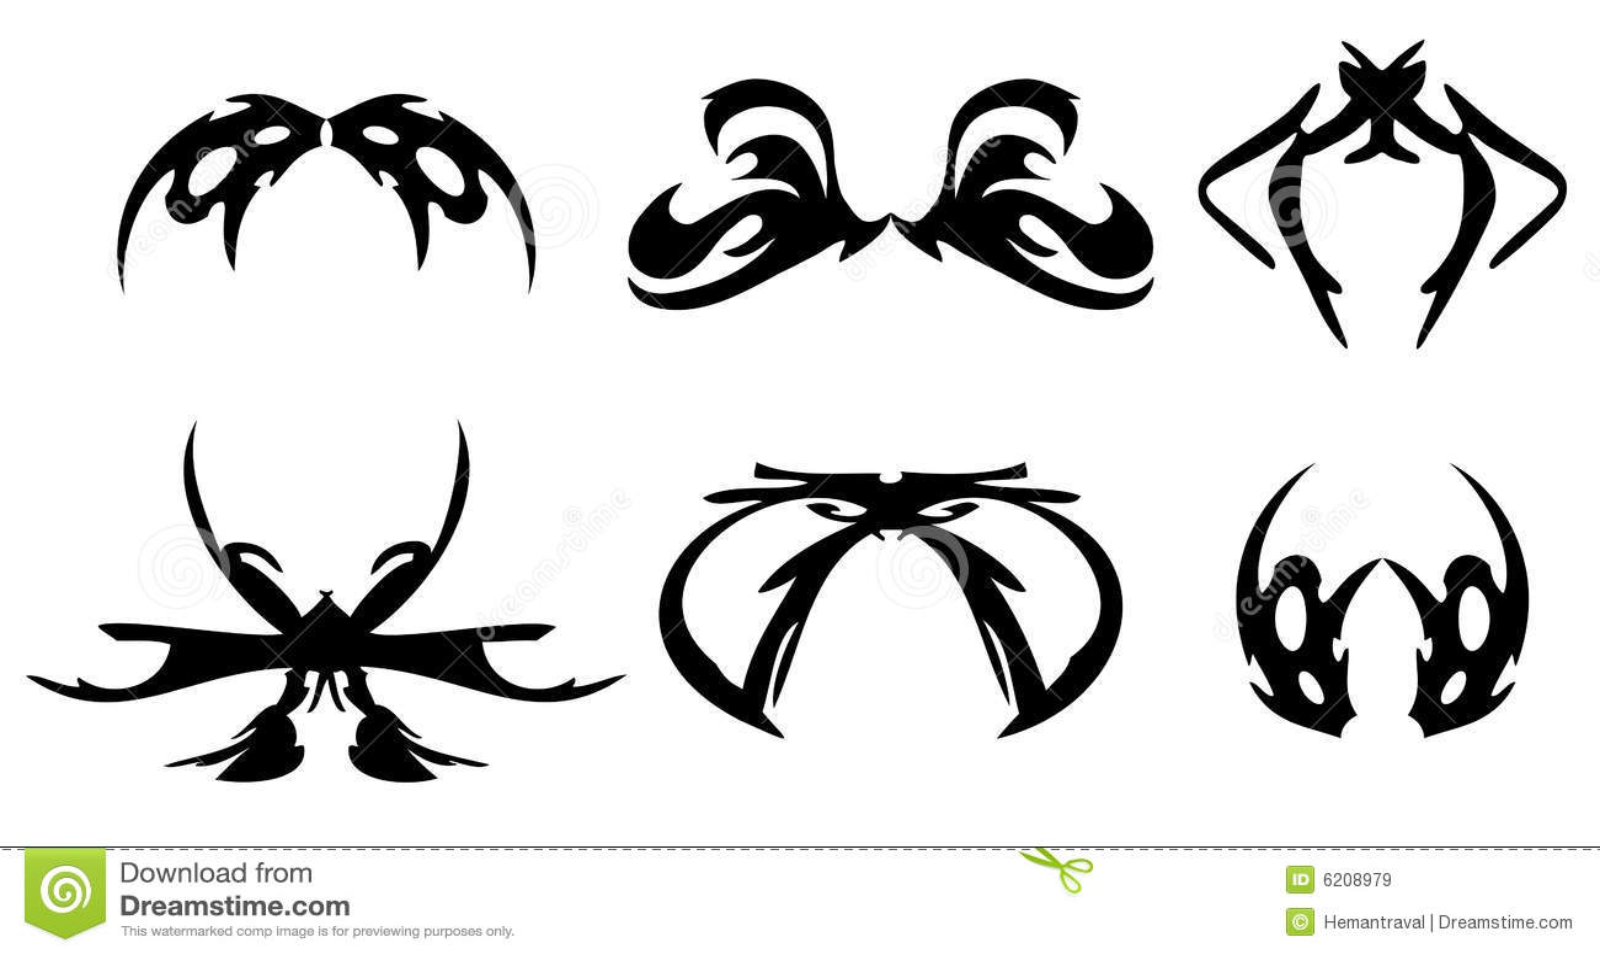 tattoo design royalty free stock images image 6208979. Black Bedroom Furniture Sets. Home Design Ideas